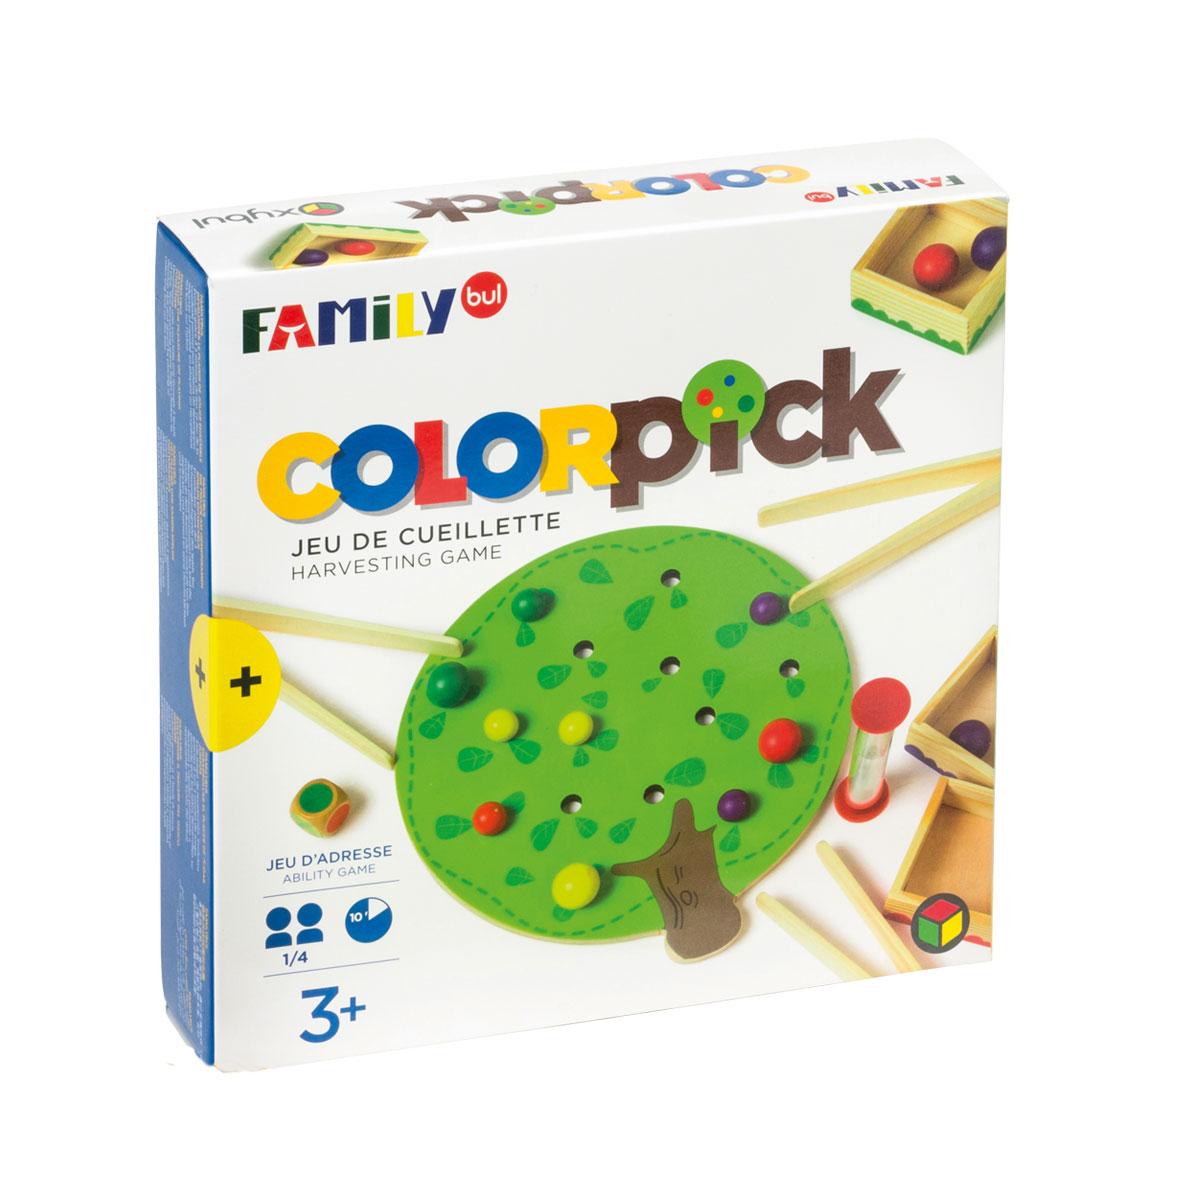 Colorpick1